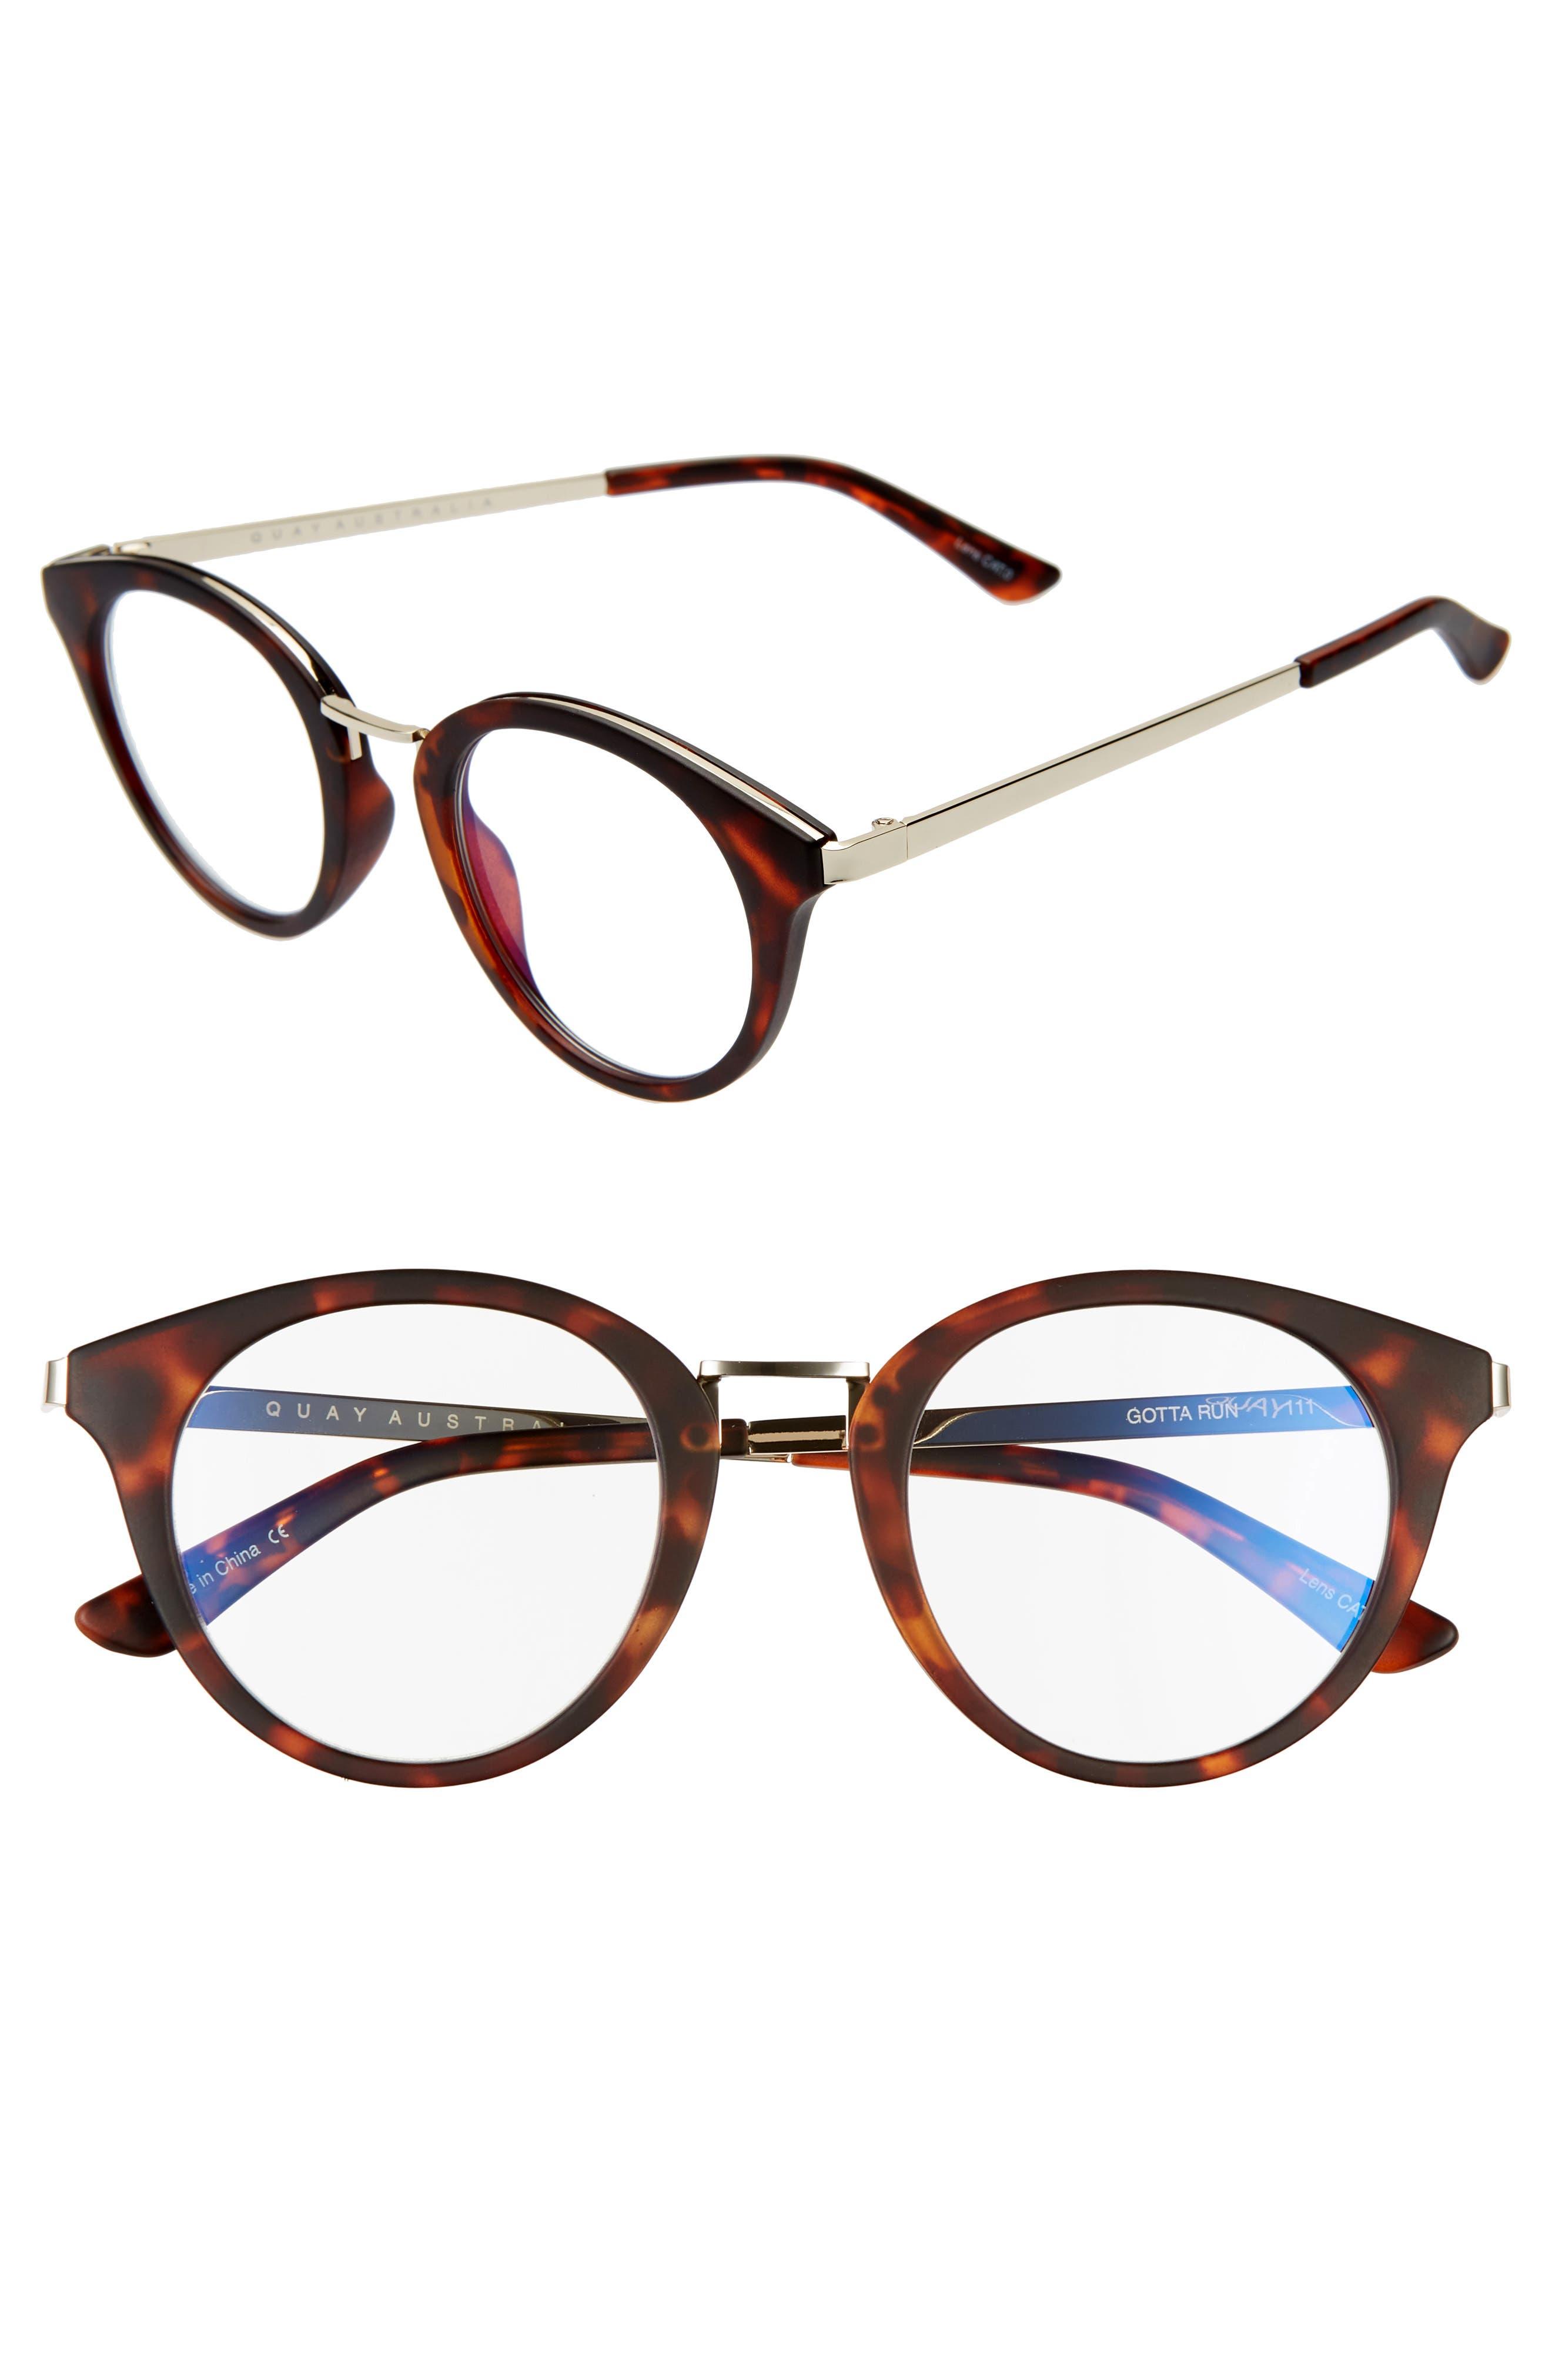 1940s Sunglasses, Glasses & Eyeglasses History Womens Quay Australia Gotta Run 46Mm Blue Light Blocking Glasses - Tortoise Clear Blue Light $60.00 AT vintagedancer.com